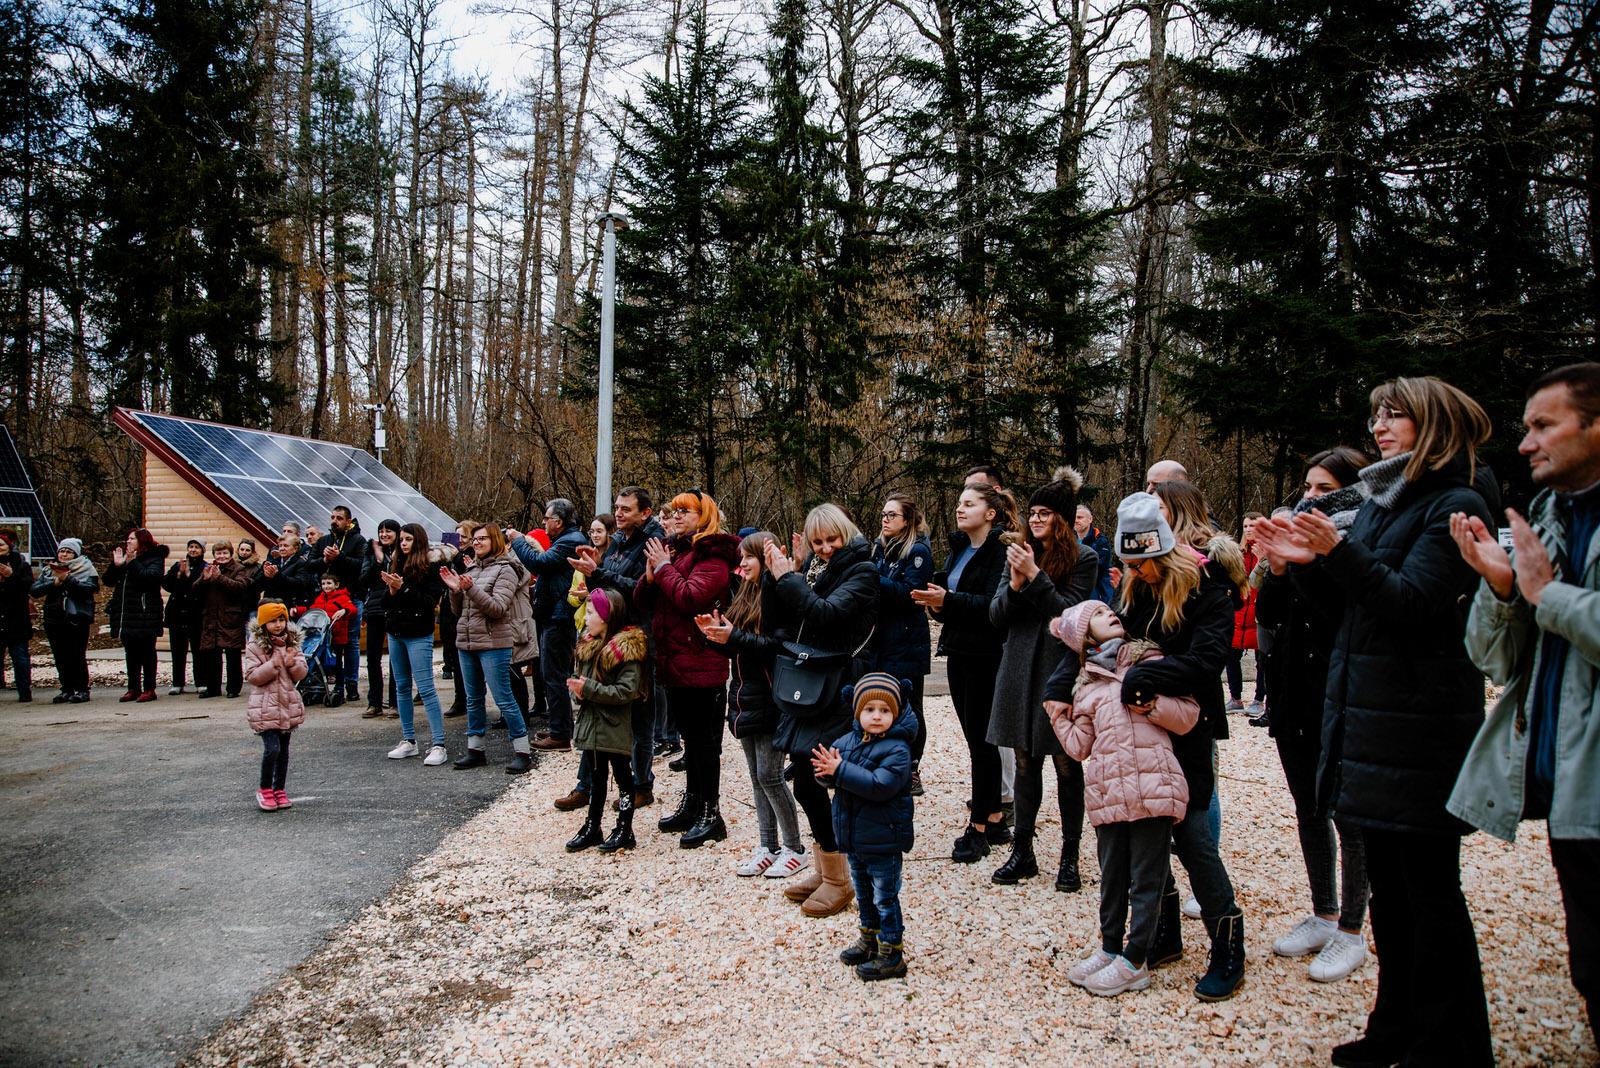 likaclub_gospić_park šuma jasikovac_projekt i video spot_2020 (30)